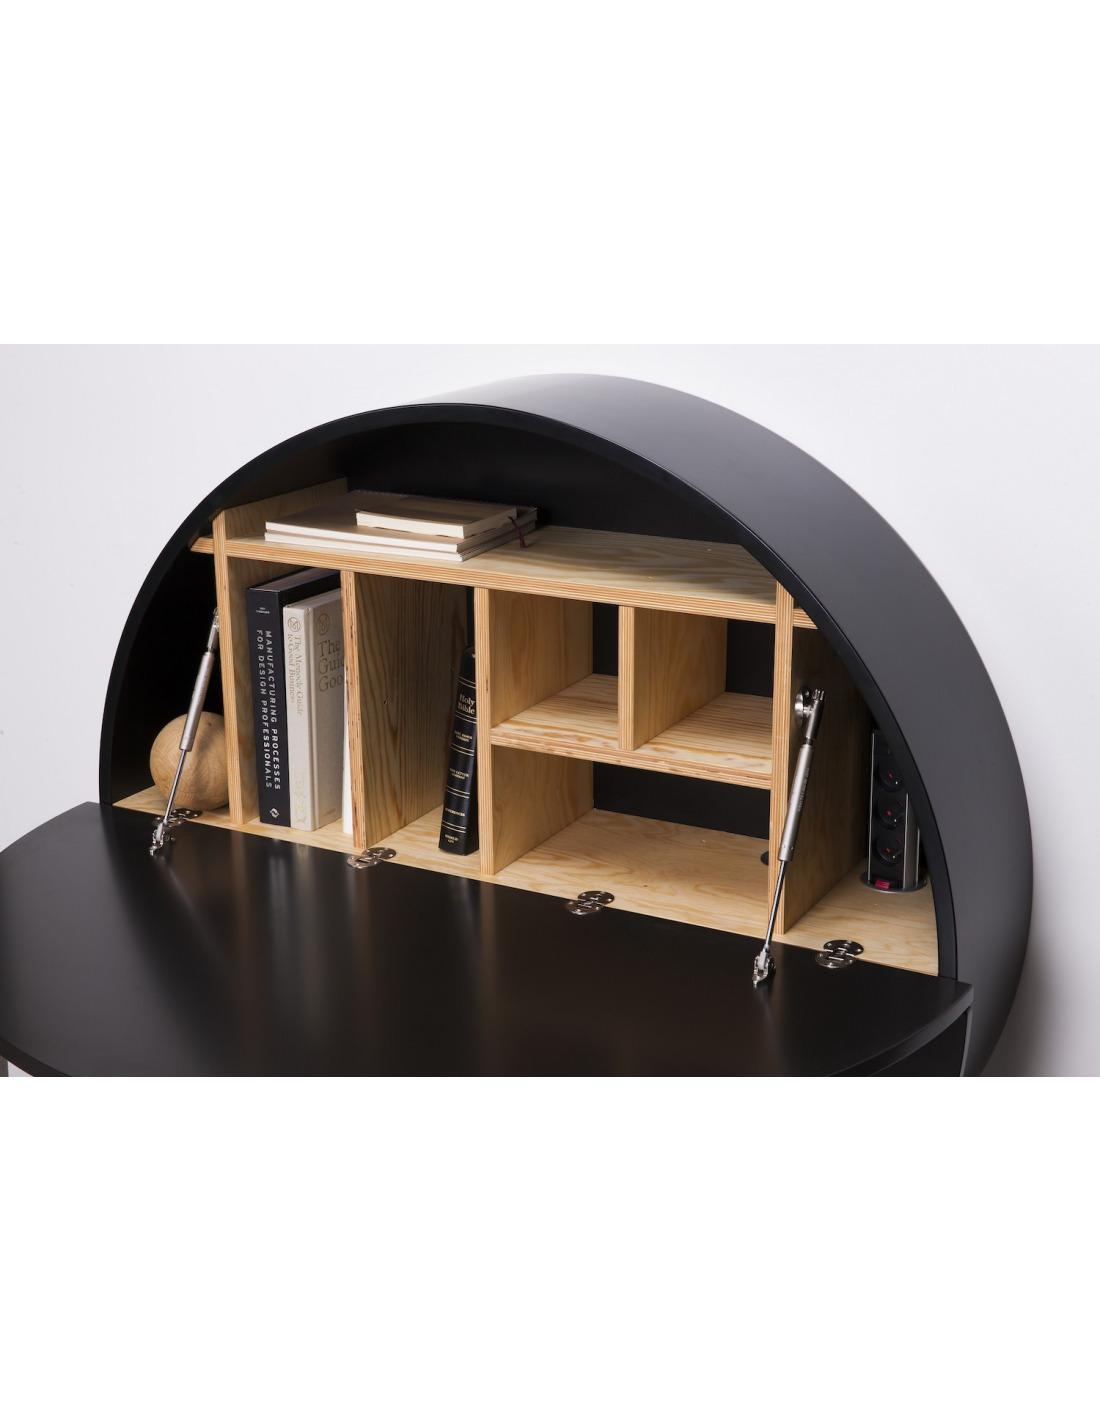 bureau mural pill noir en bois par inesa malafej au design scandinave otoko. Black Bedroom Furniture Sets. Home Design Ideas